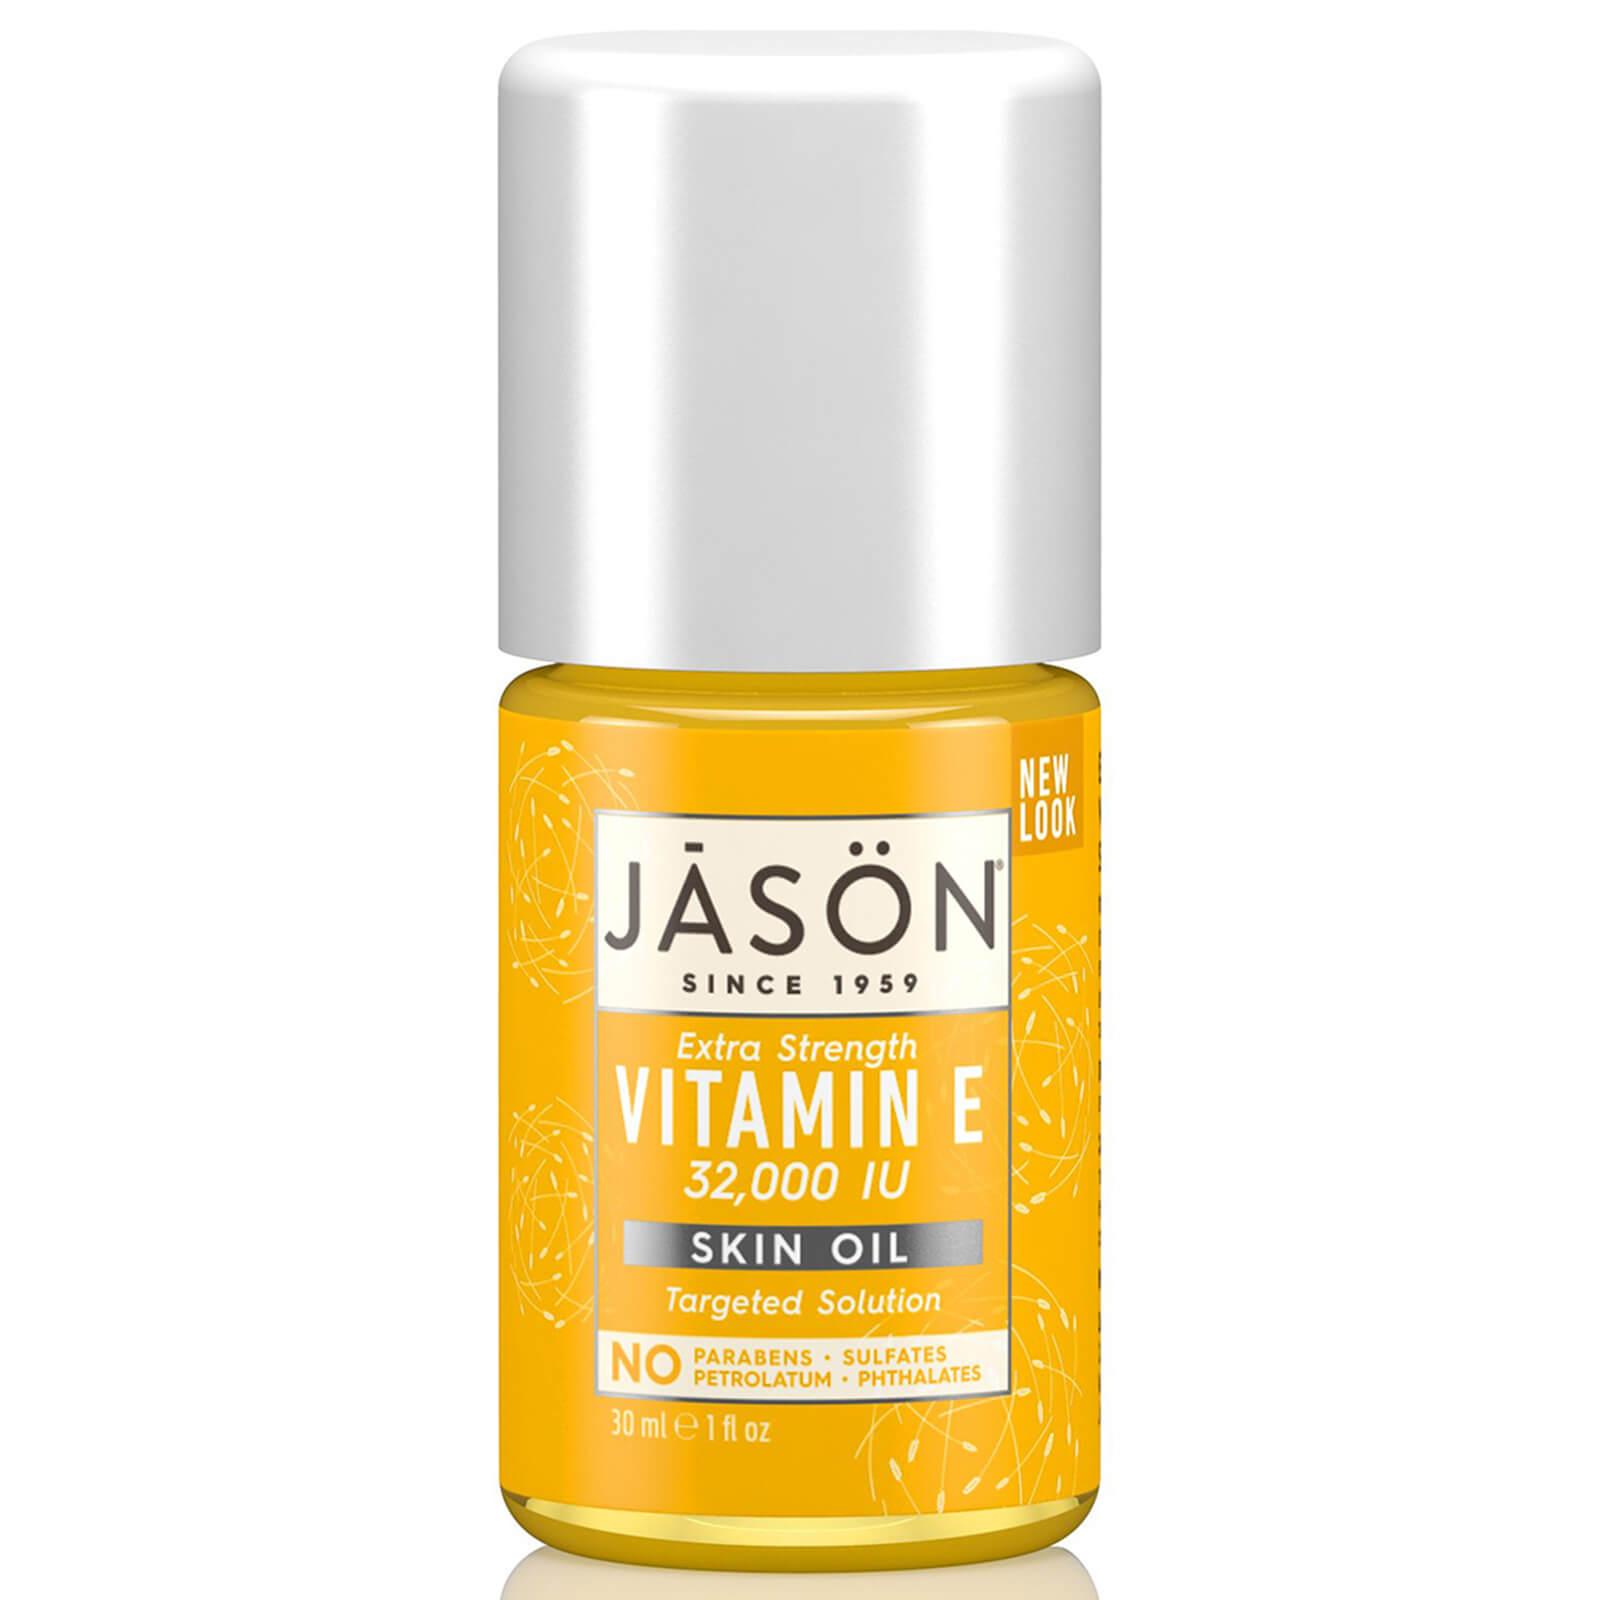 jason vitamin e 32,000iu oil - scar & stretch mark treatment (1 fl oz.)